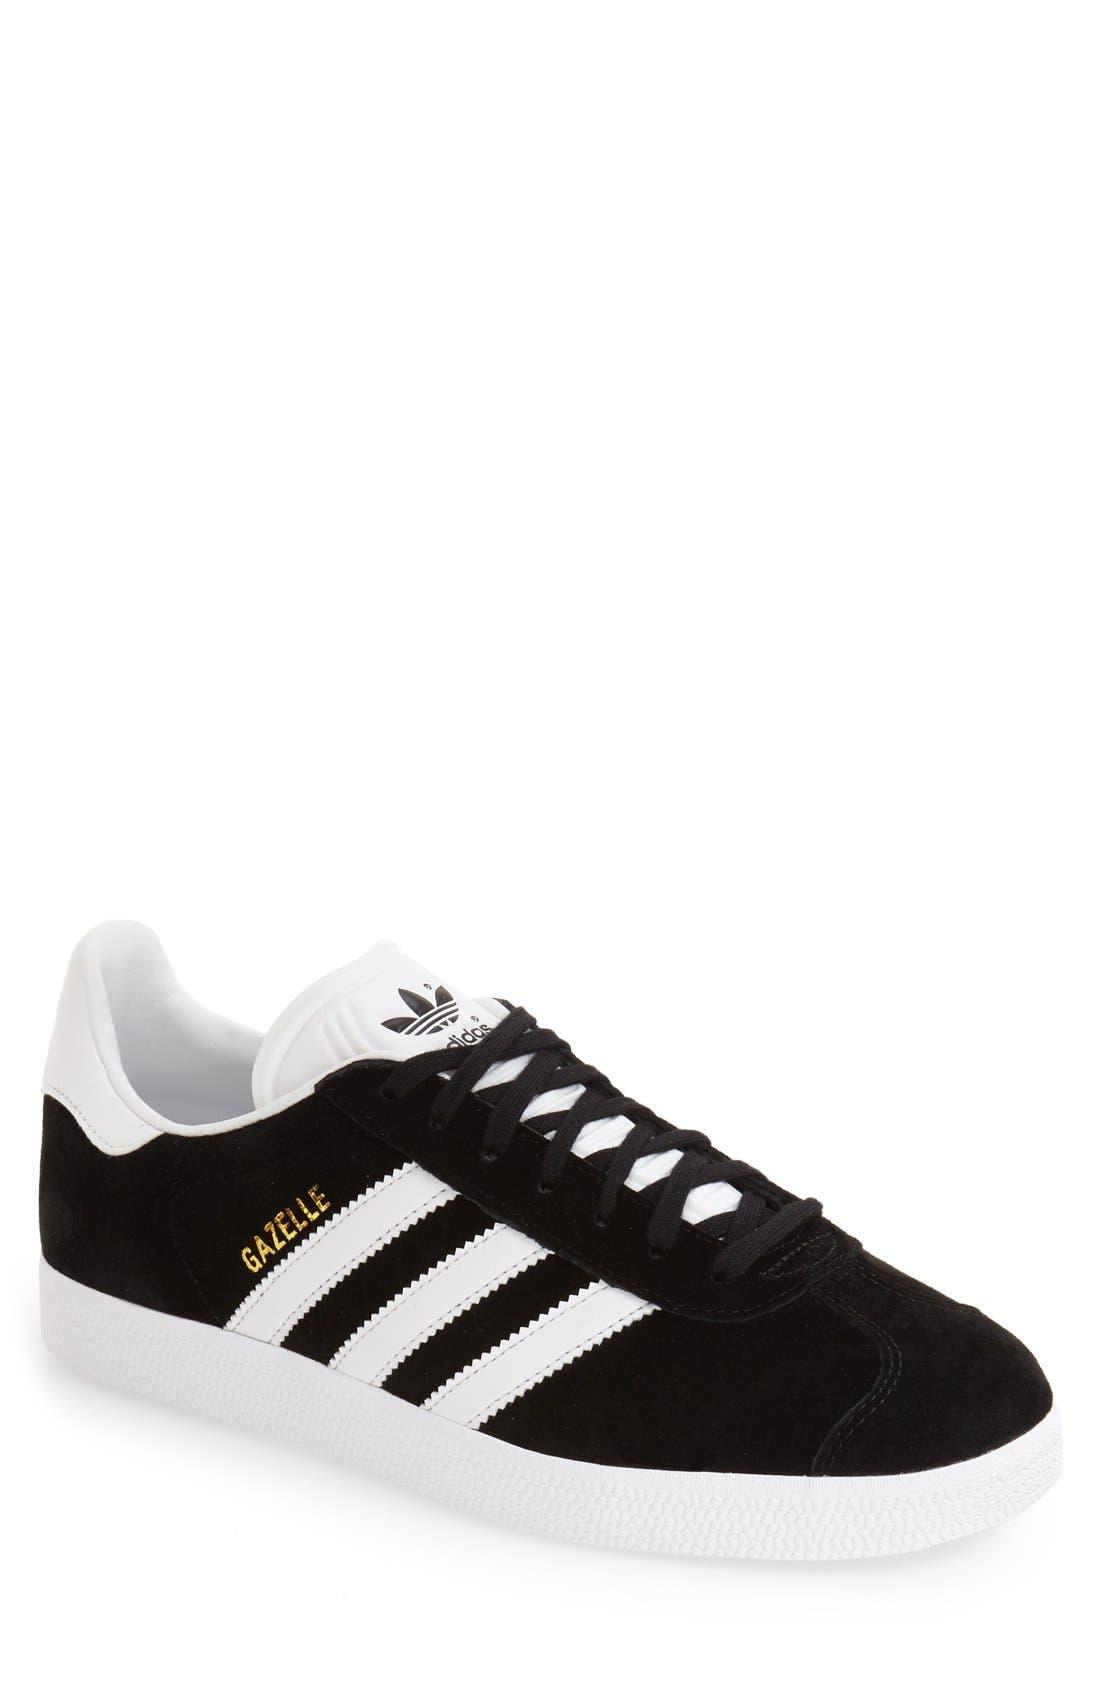 Image of adidas Gazelle Sneaker